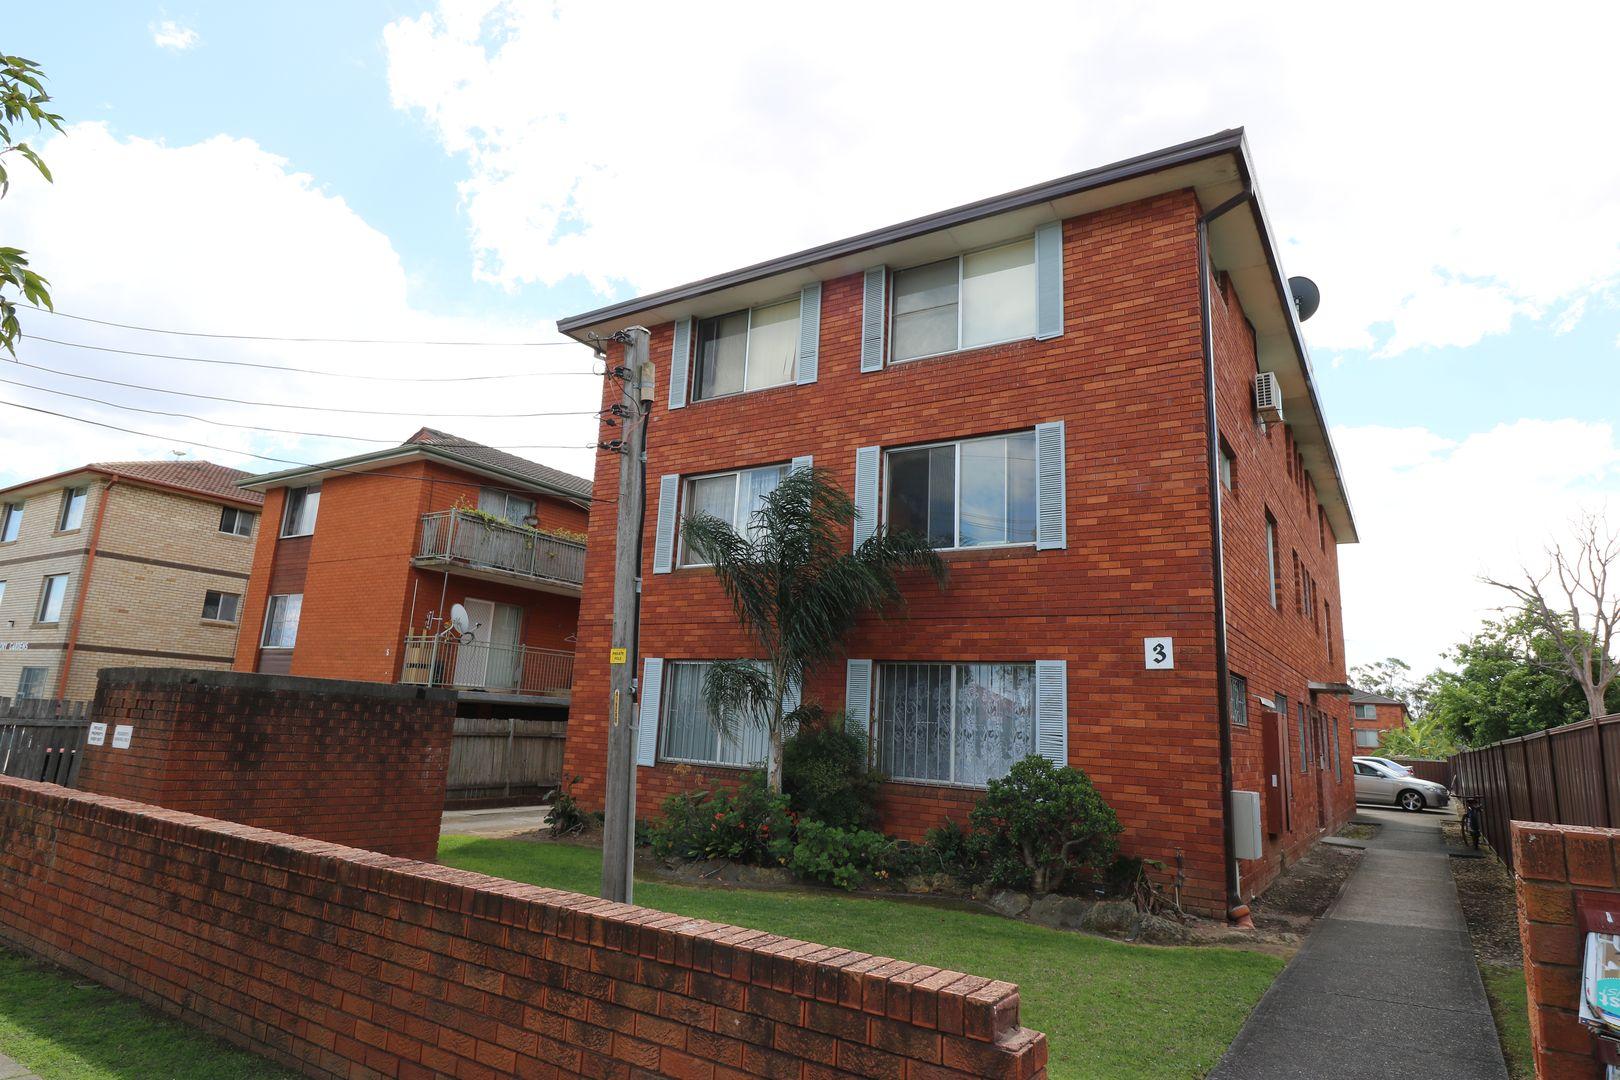 7/3 Bridge Street, Cabramatta NSW 2166, Image 0